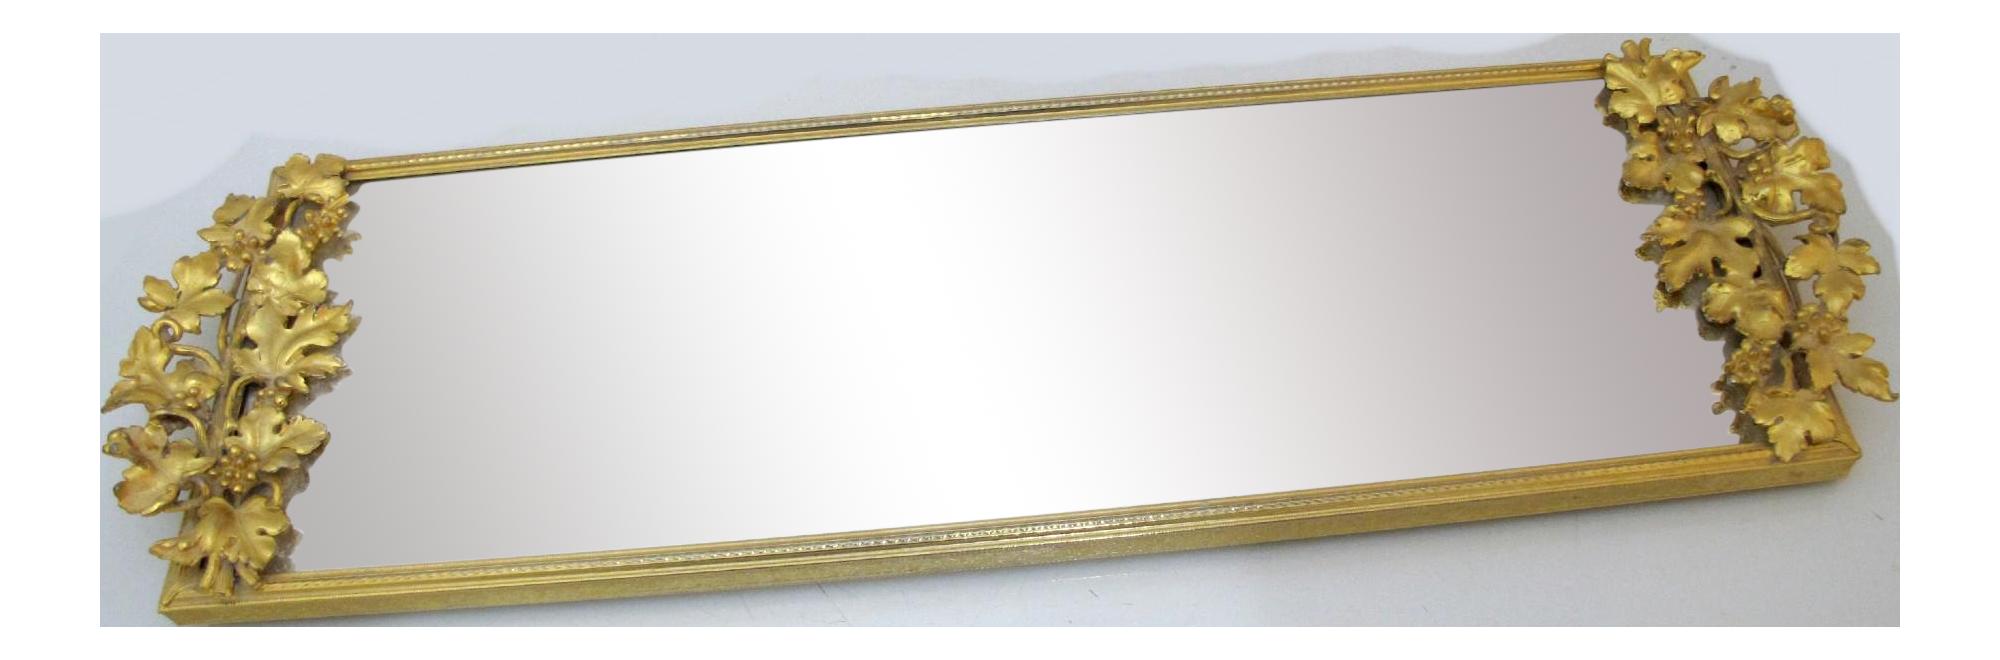 Vintage Gilt Brass Leaves Design Rectangular Vanity Tray Or Wall Mirror Chairish